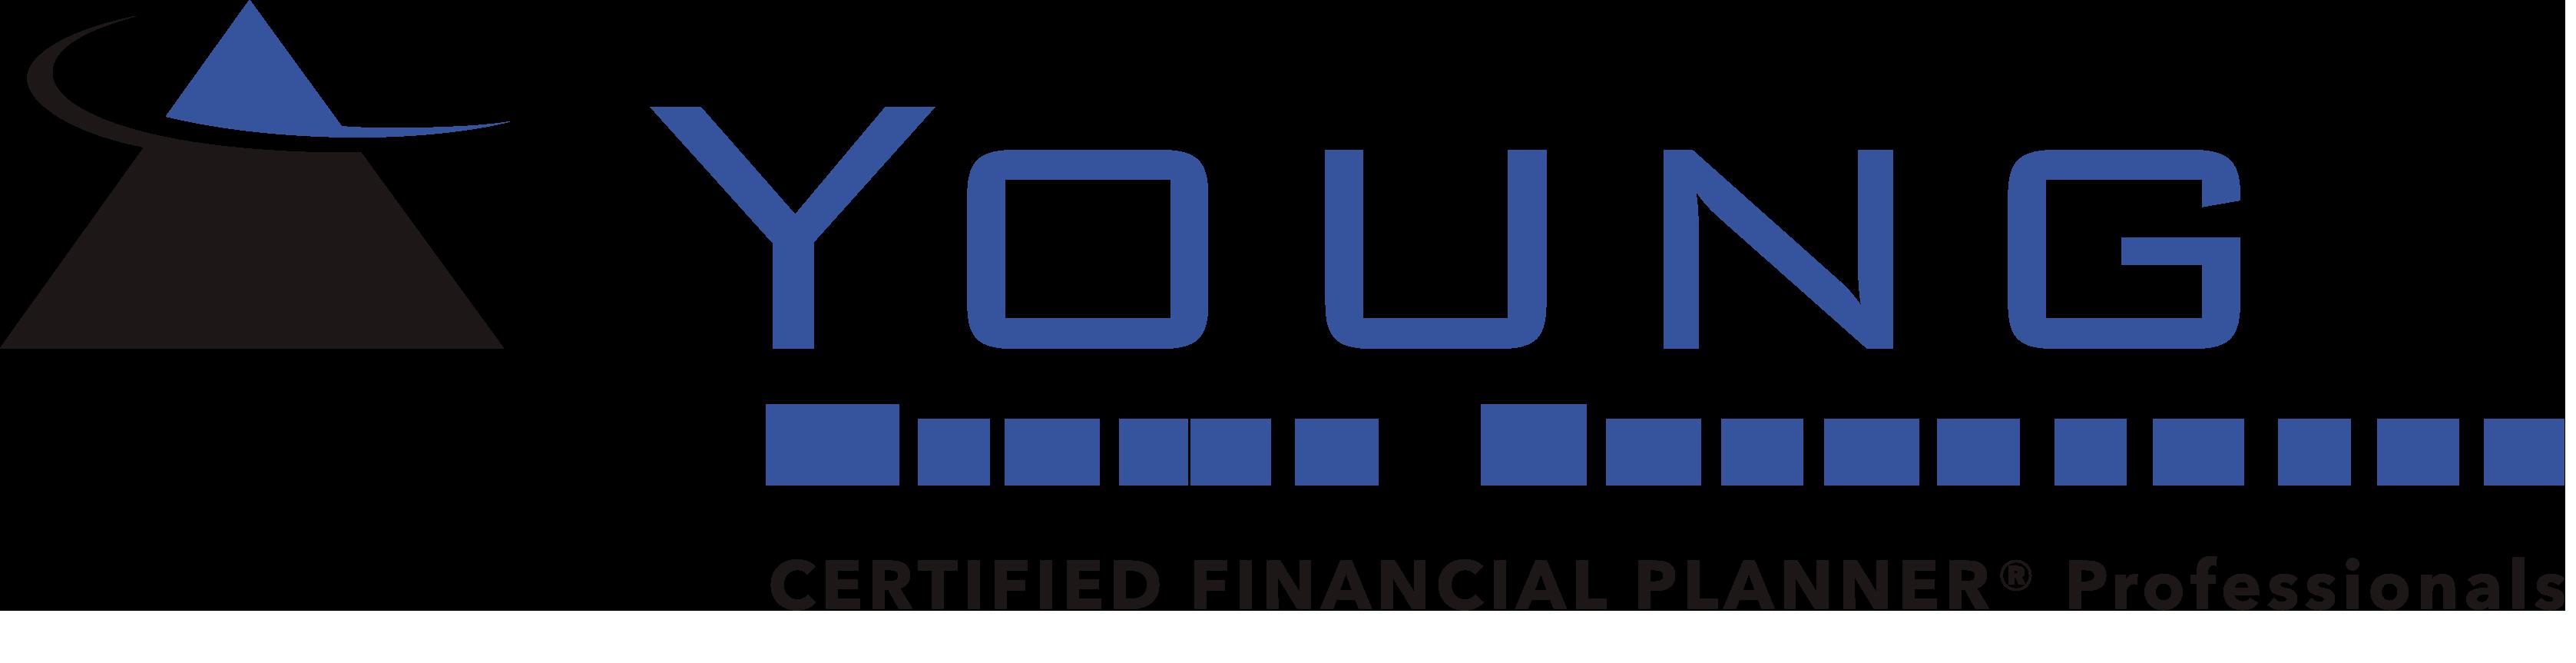 Davis & Sacramento, CA CFP, Fee-Only Financial Planning